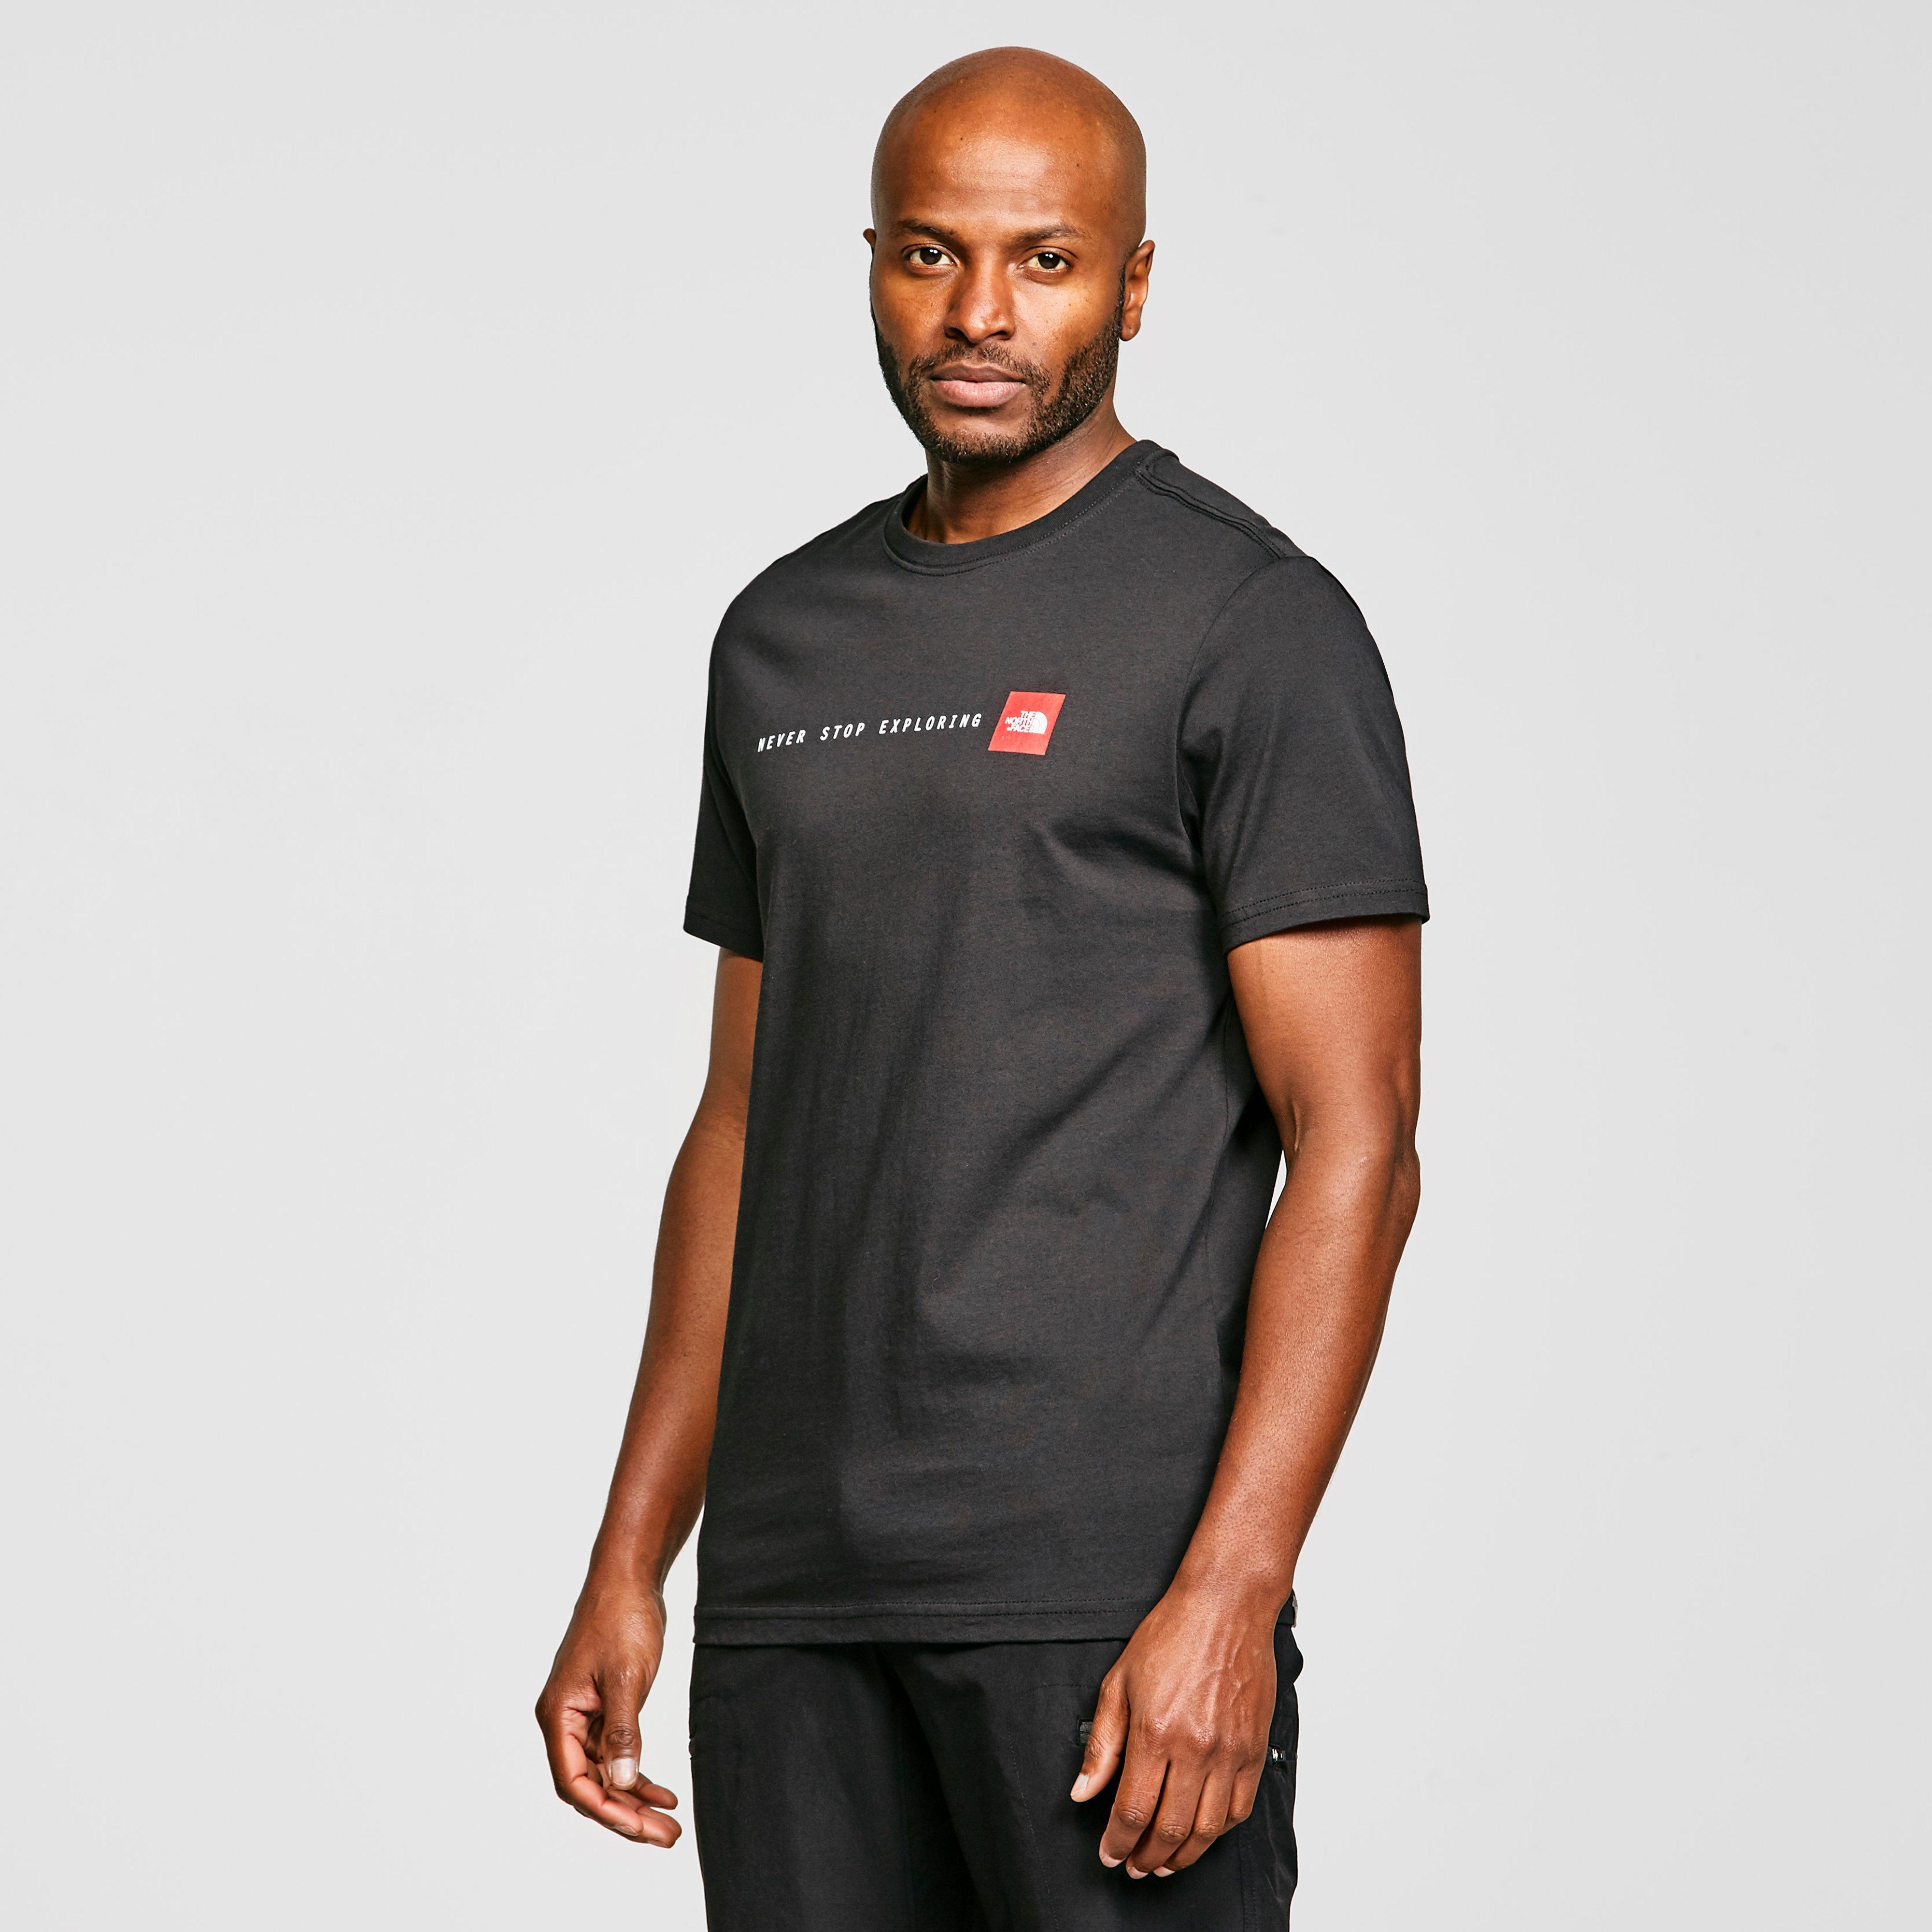 e27dd3eef Men's Never Stop Exploring Short Sleeve T-Shirt